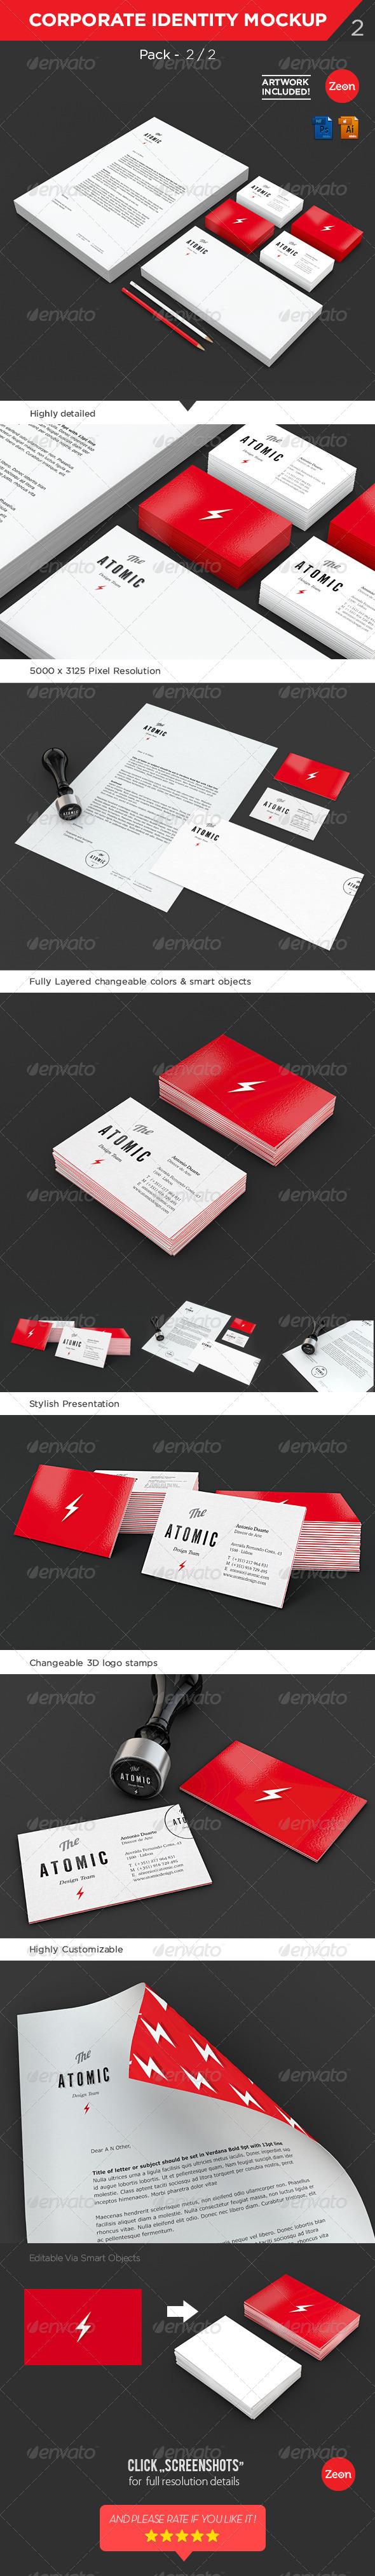 Brand Identity Stationary Mockup Pack 2 2